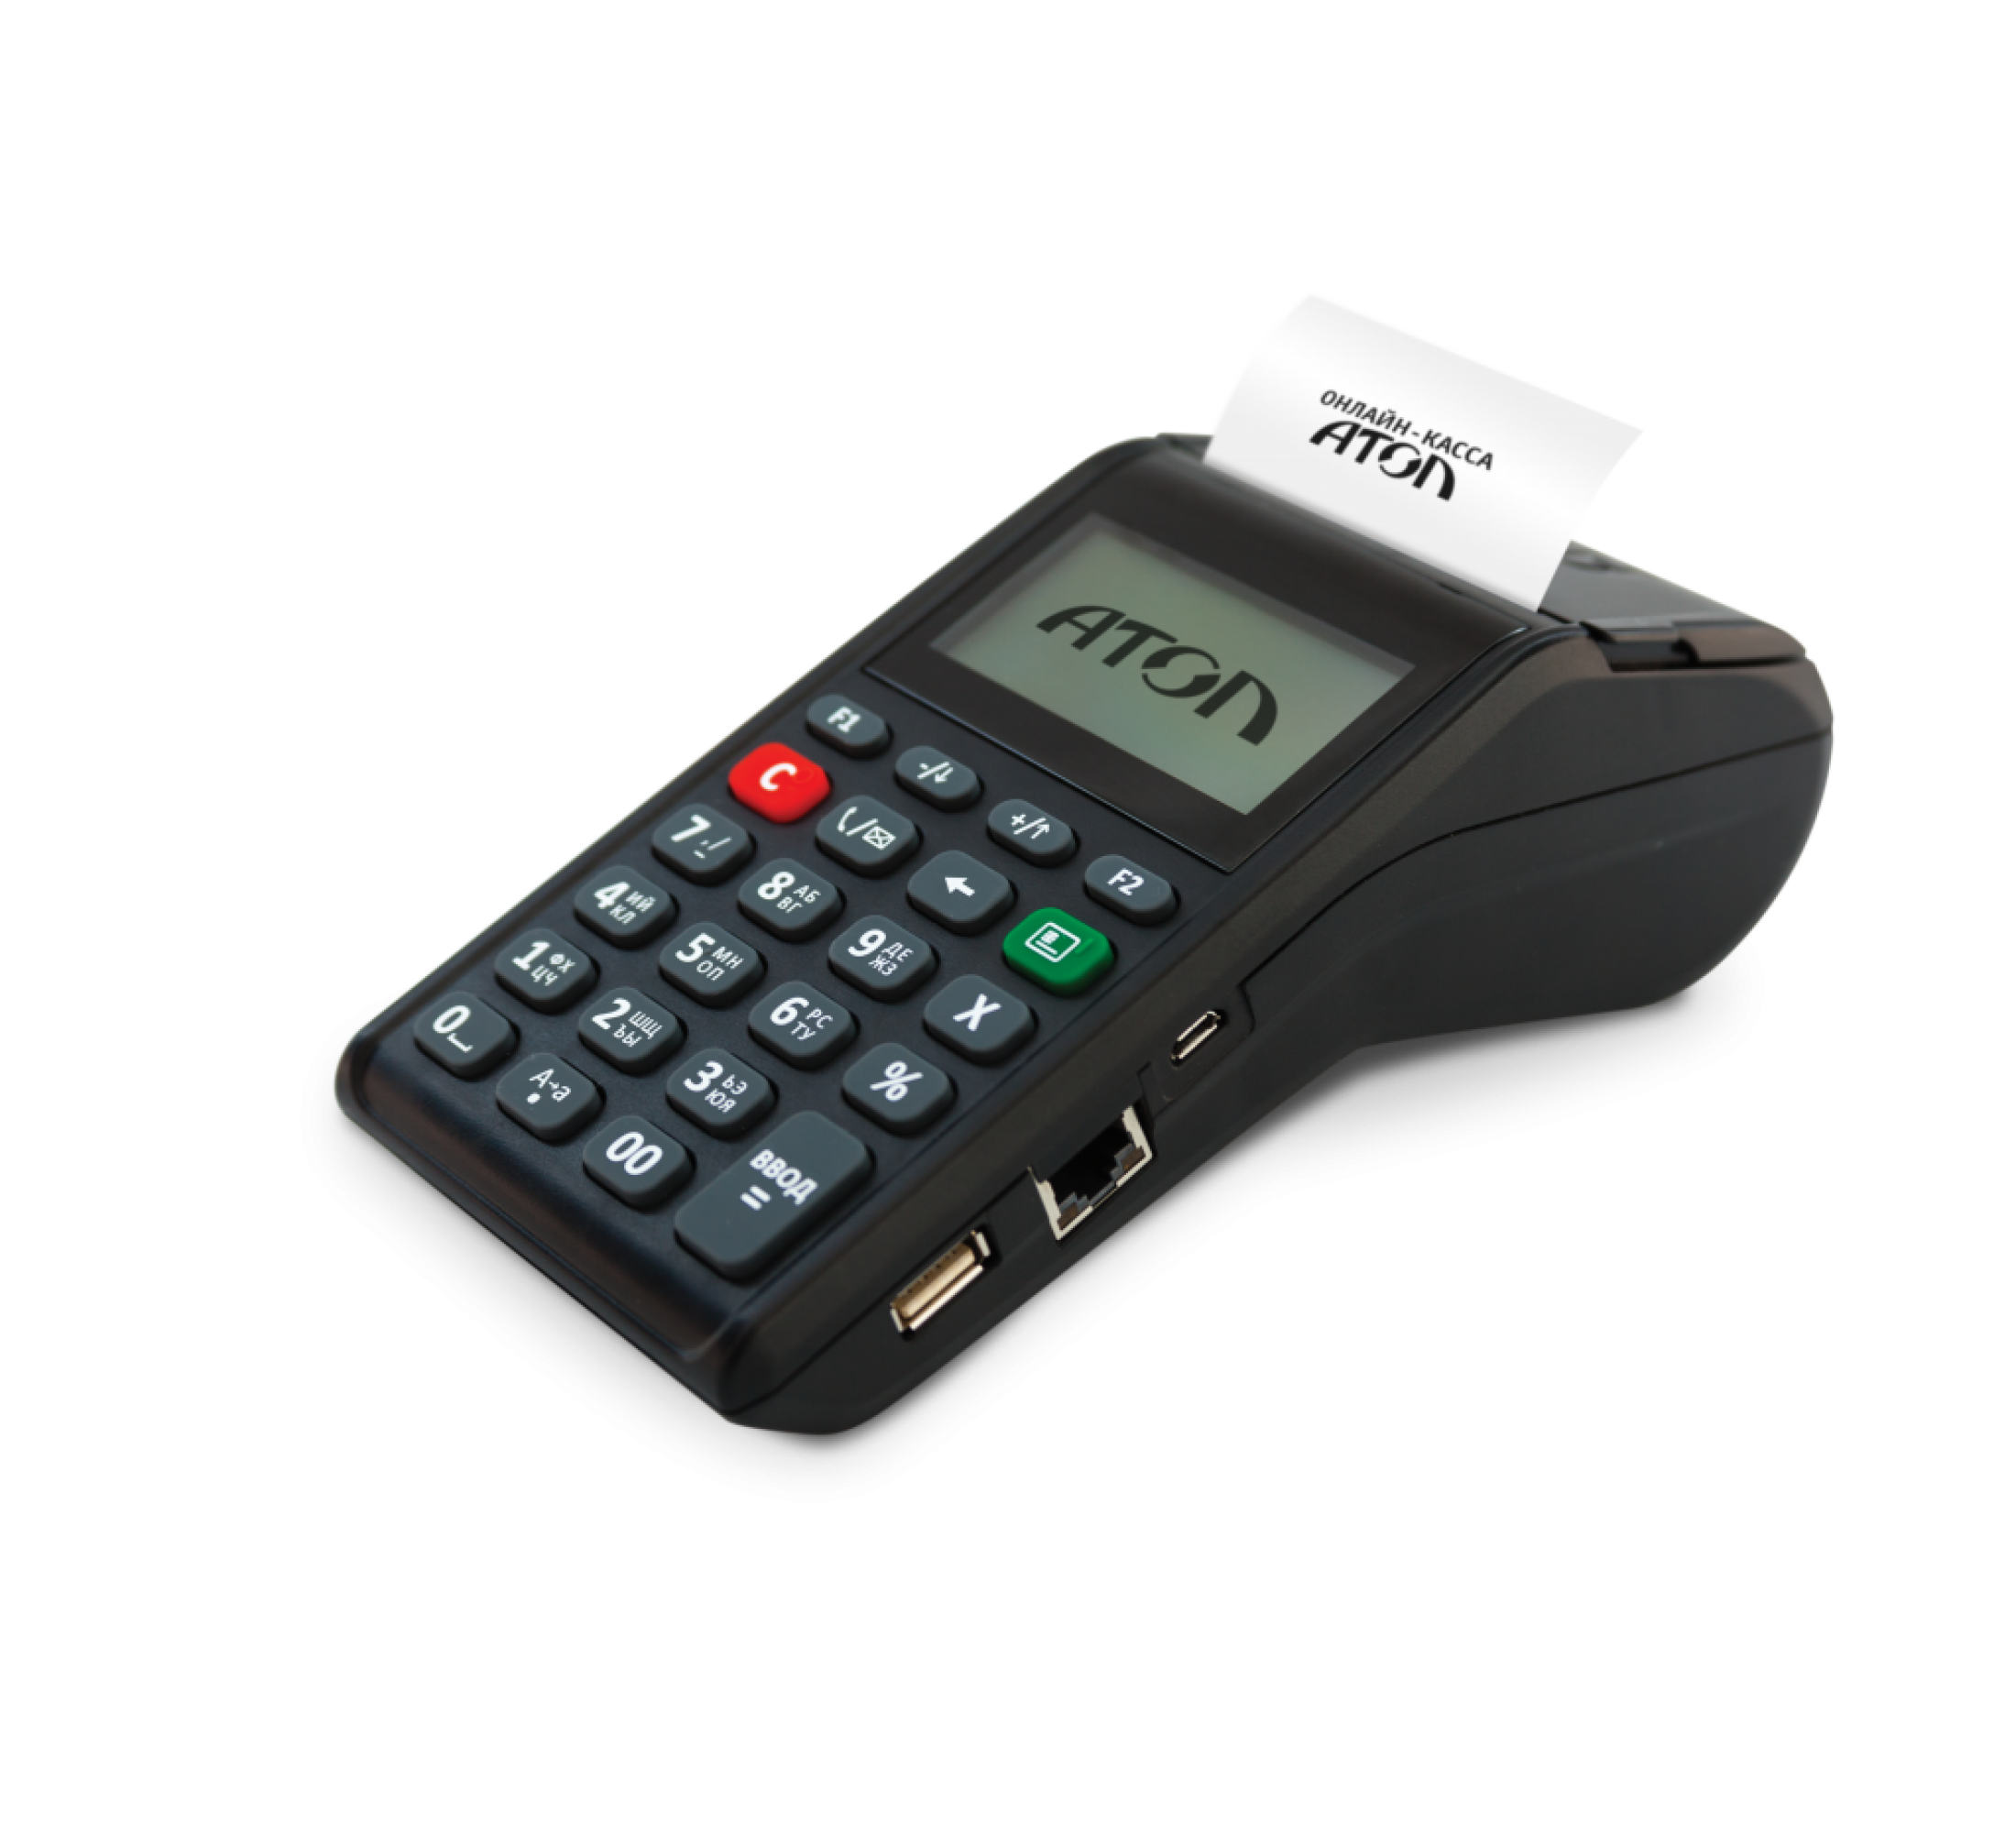 Онлайн-касса АТОЛ 91Ф (ФН36, Wi-Fi, BT, 2G, Ethernet, чёрная)  АКЦИЯ!!! Сканер ШК или Детектор валют в подарок!